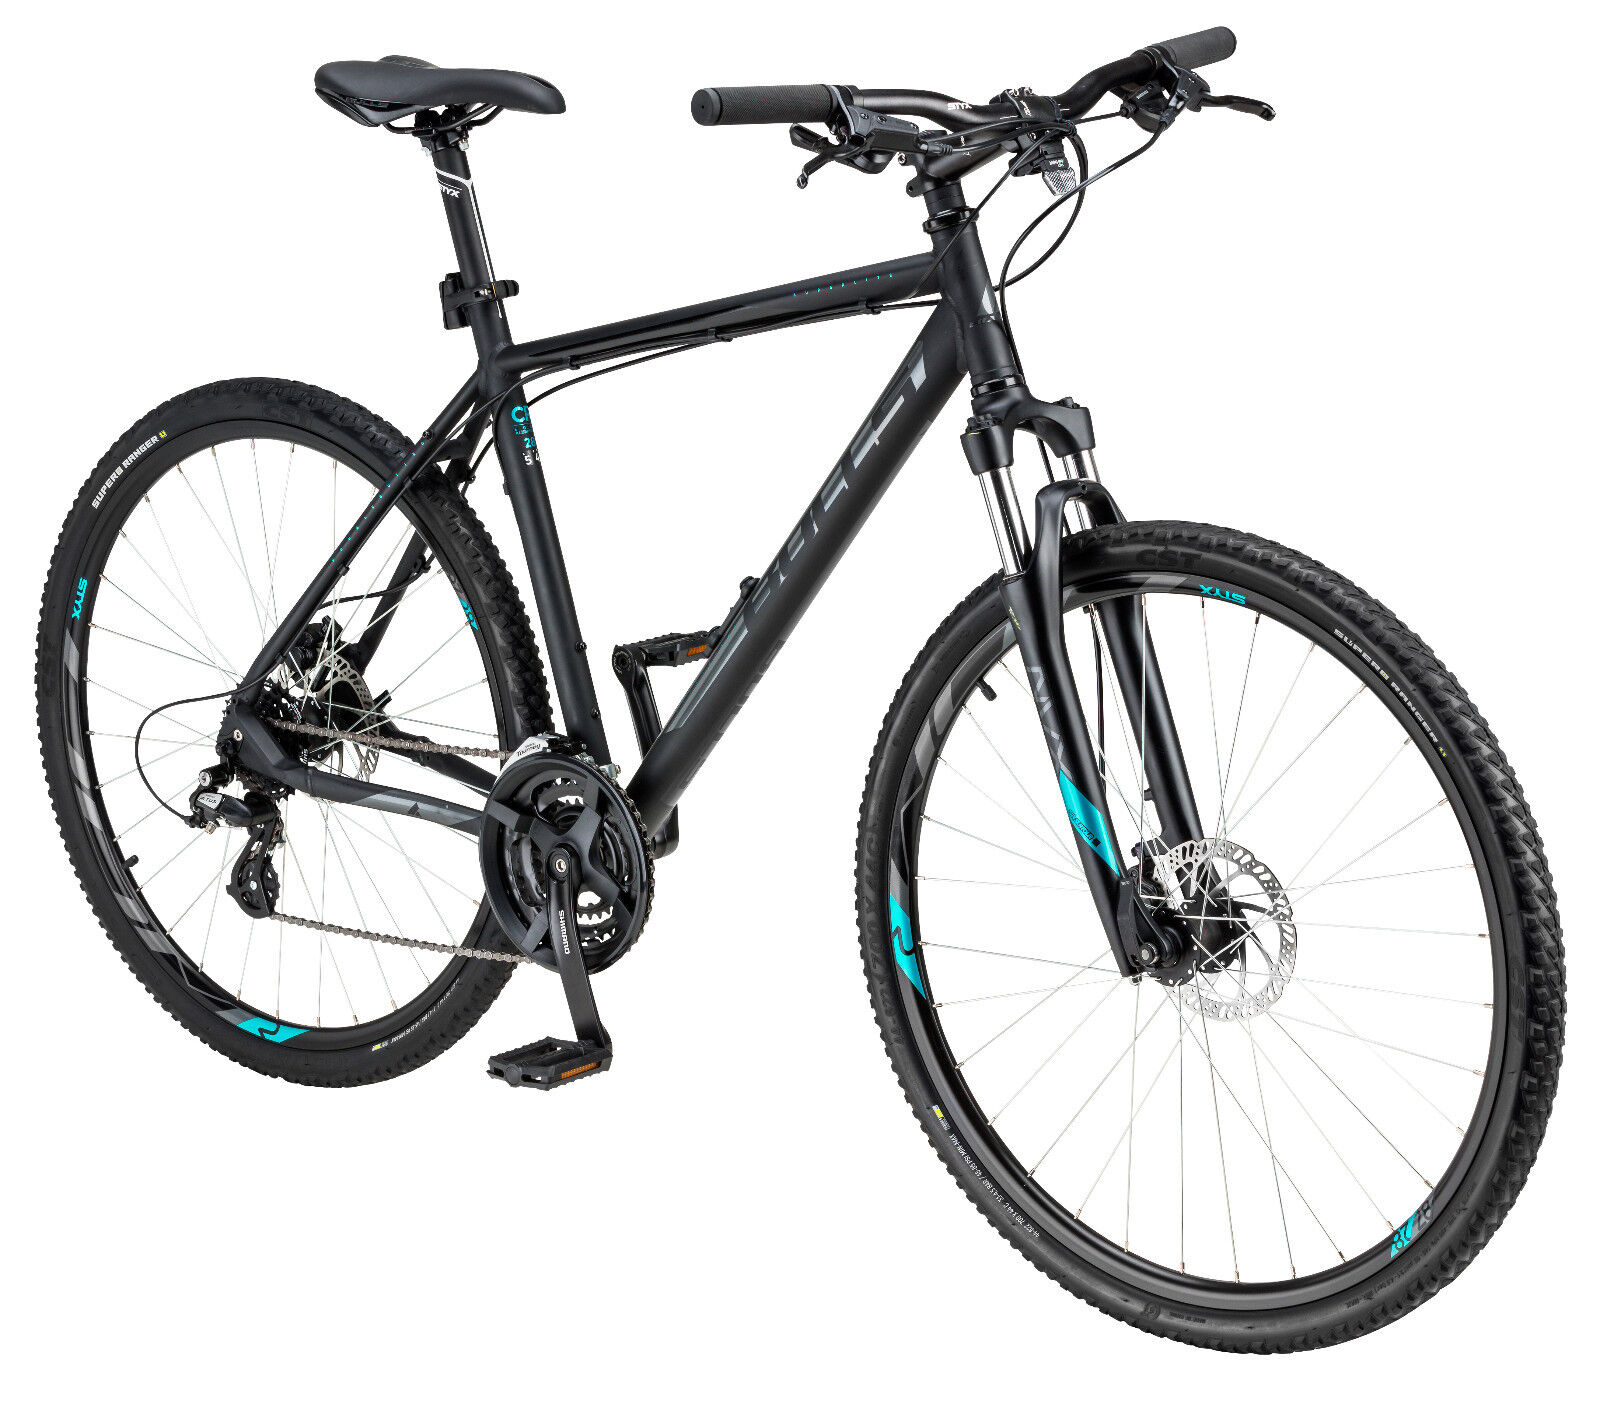 BULLS CROSSBIKE DISC 28 Zoll Crossrad Trekking Shimano Fahrrad schwarz 54cm 2019